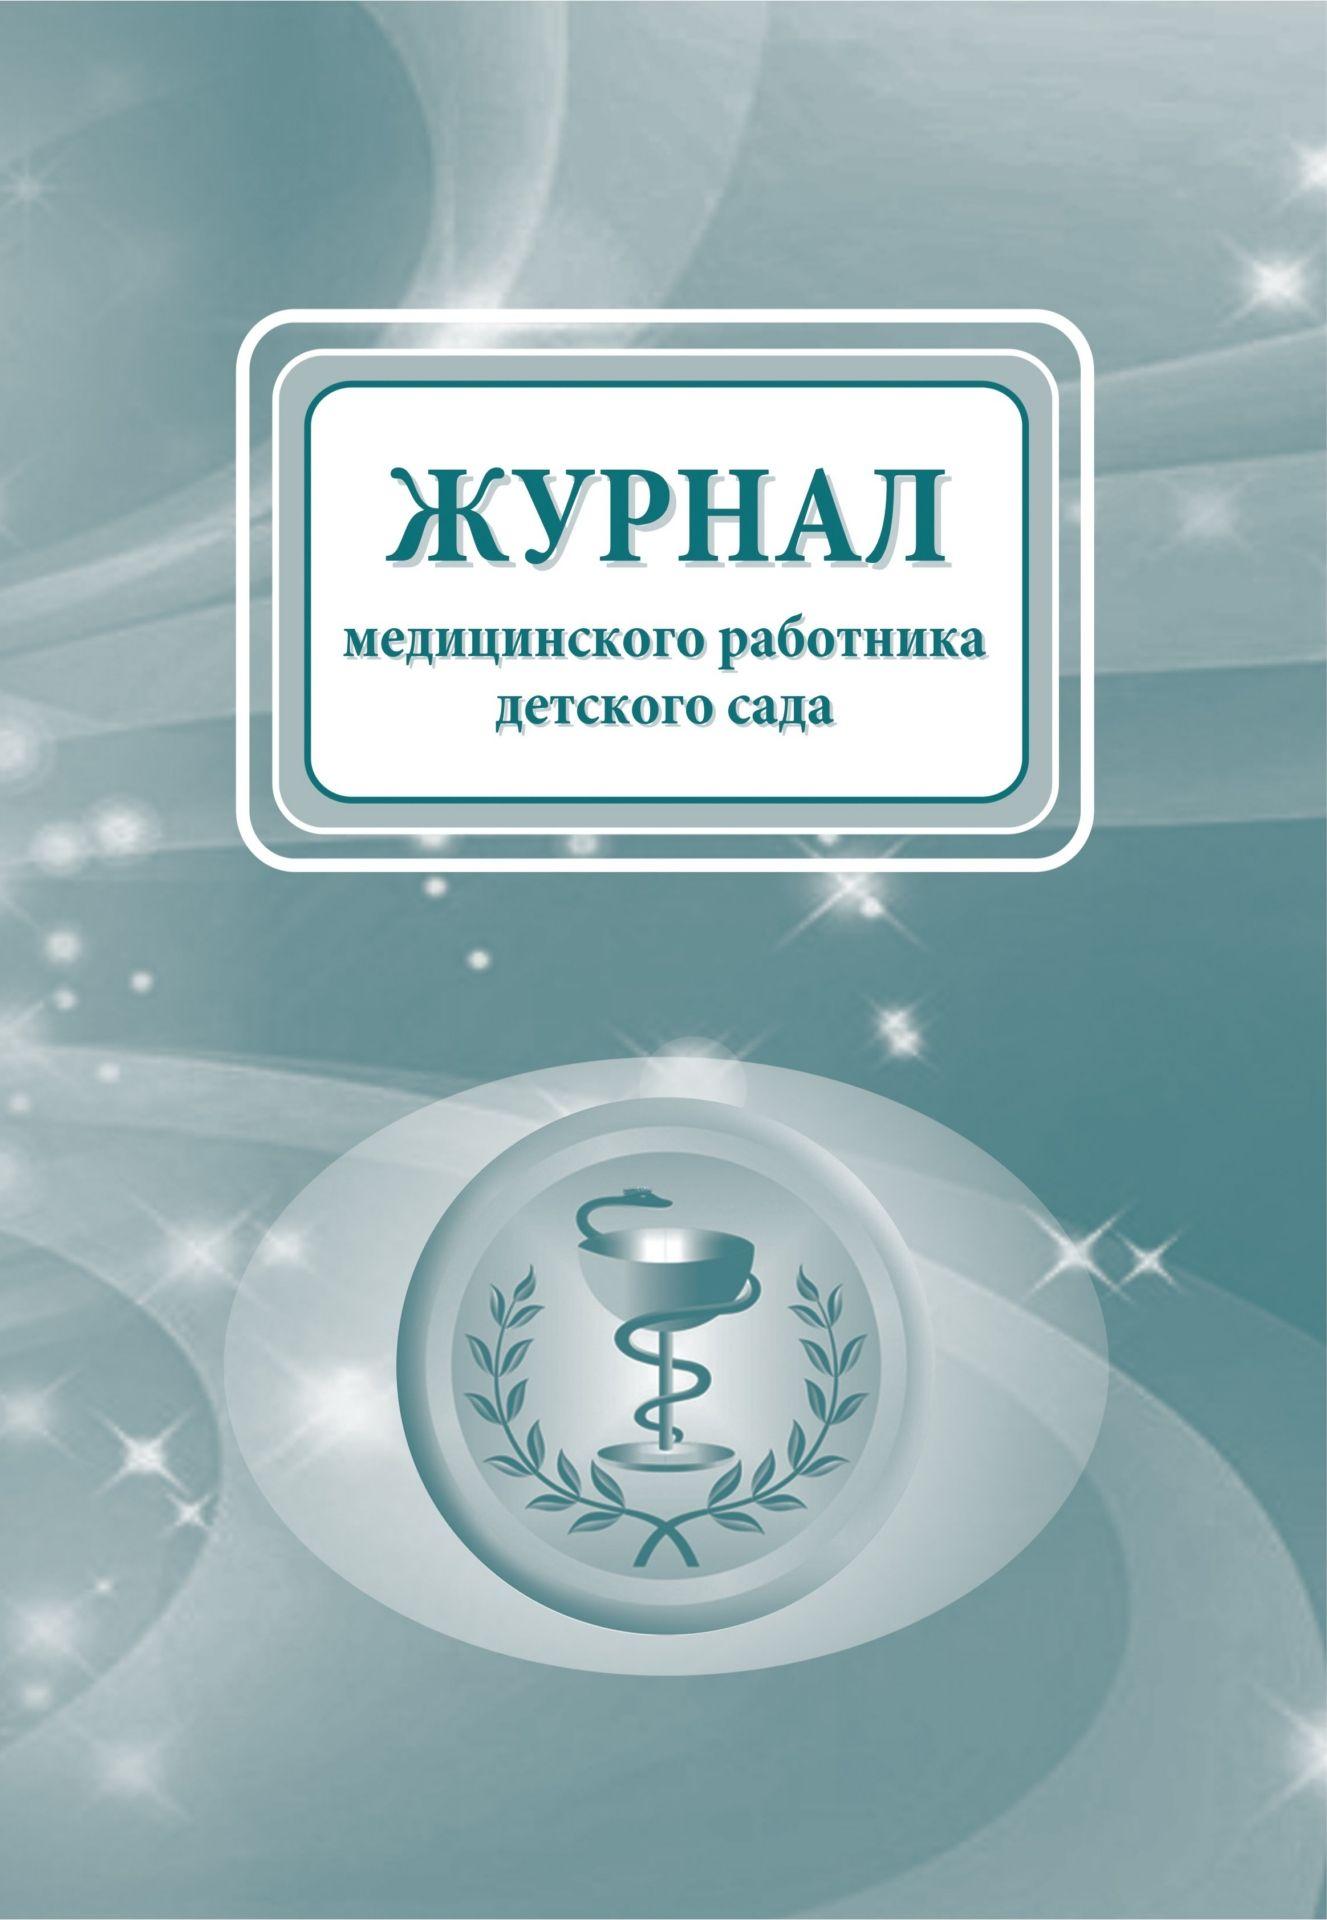 Журнал медицинского работника детского сада